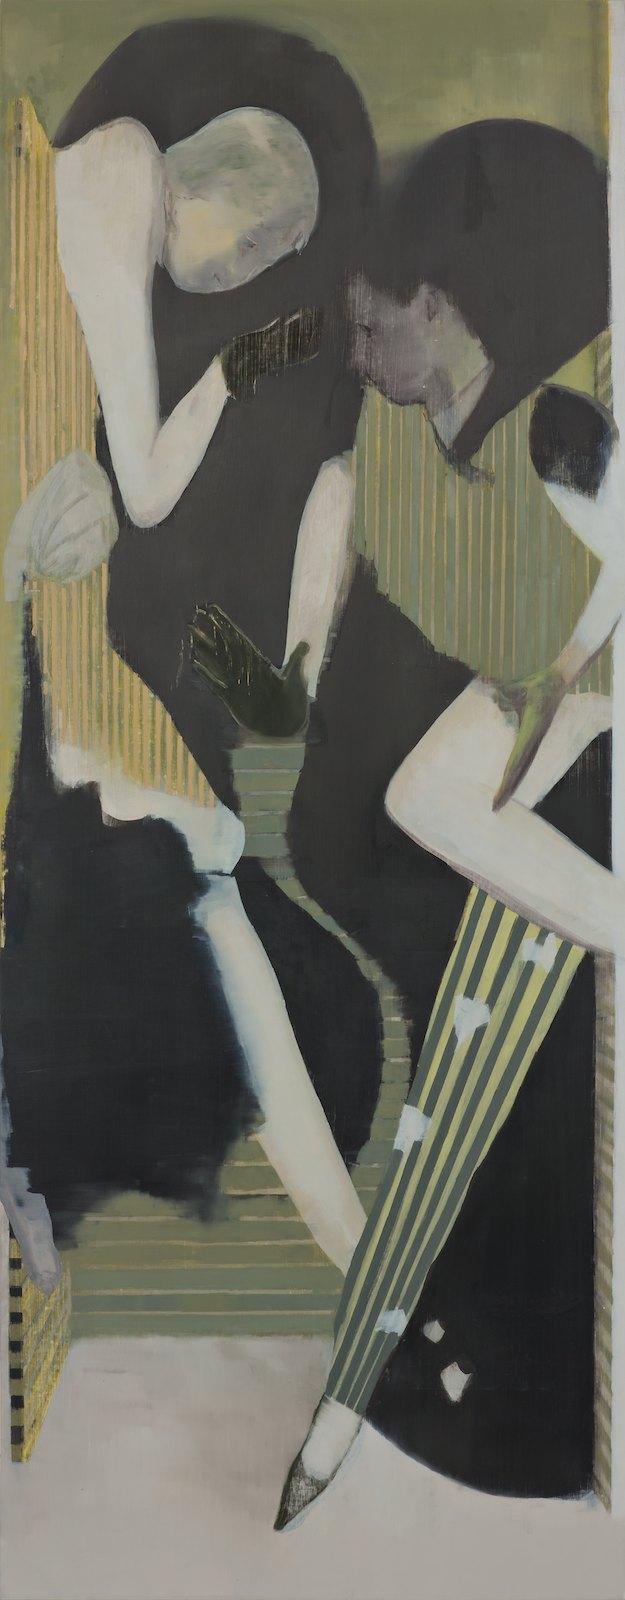 The Hazardous Paces, 2012, oil on canvas over panel , 242 x 95 cm